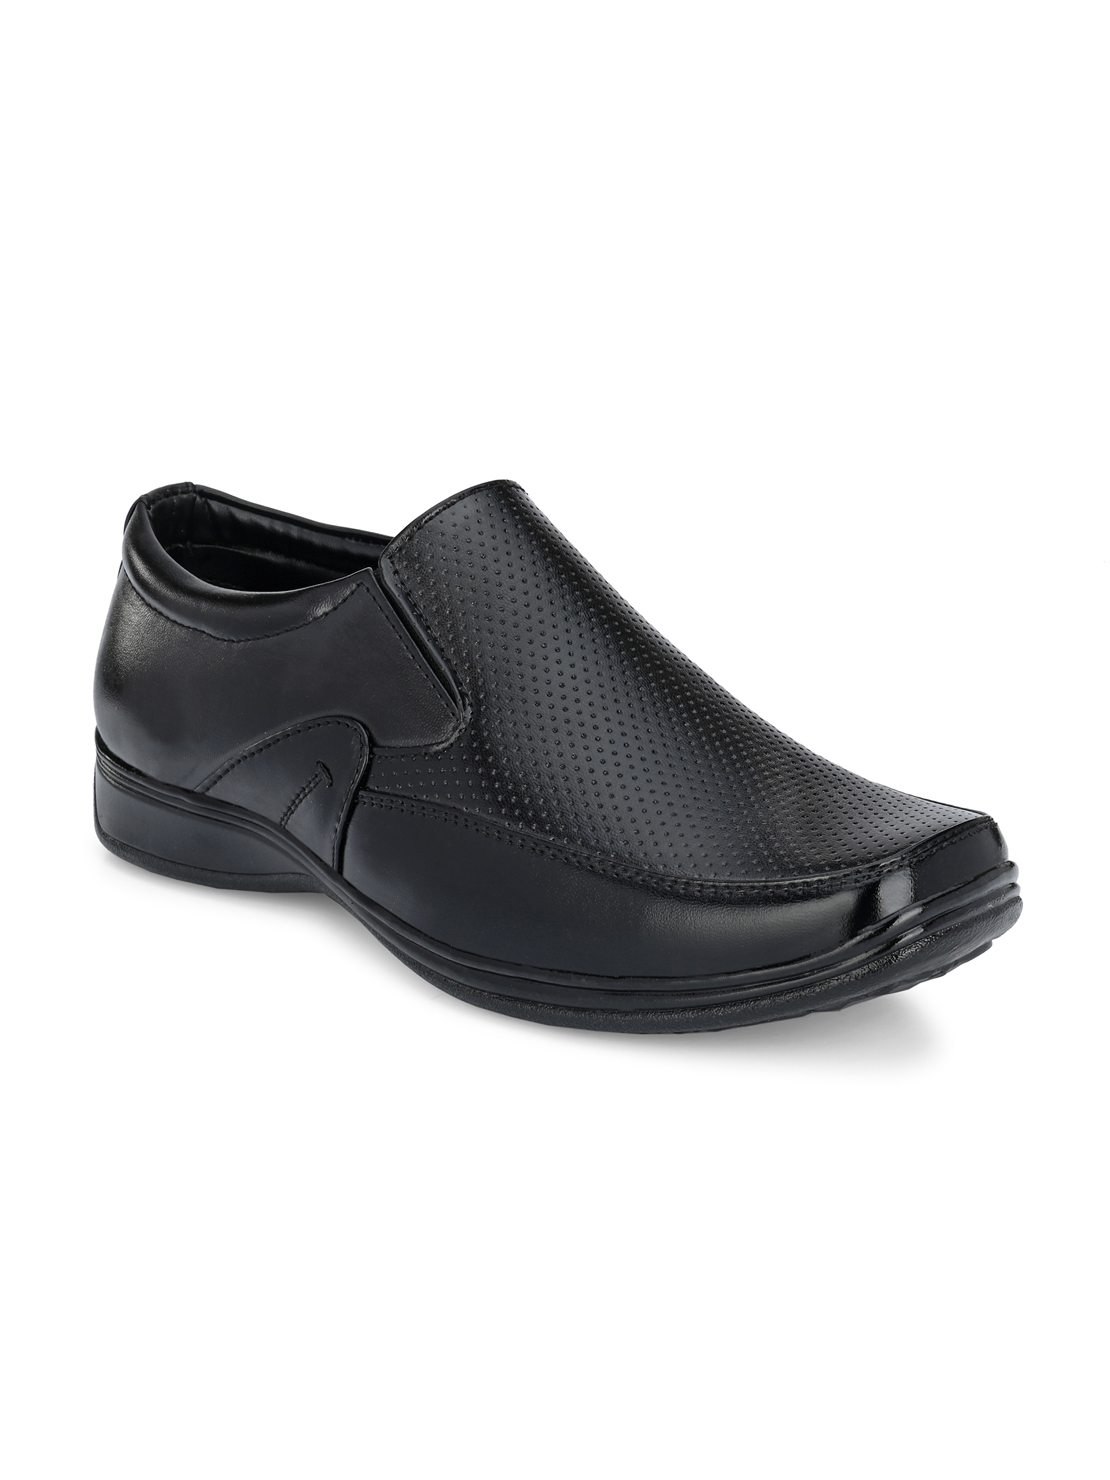 Guava | Guava Men's Square Toe Black Slip-On Formal Shoes - 6 (UK)